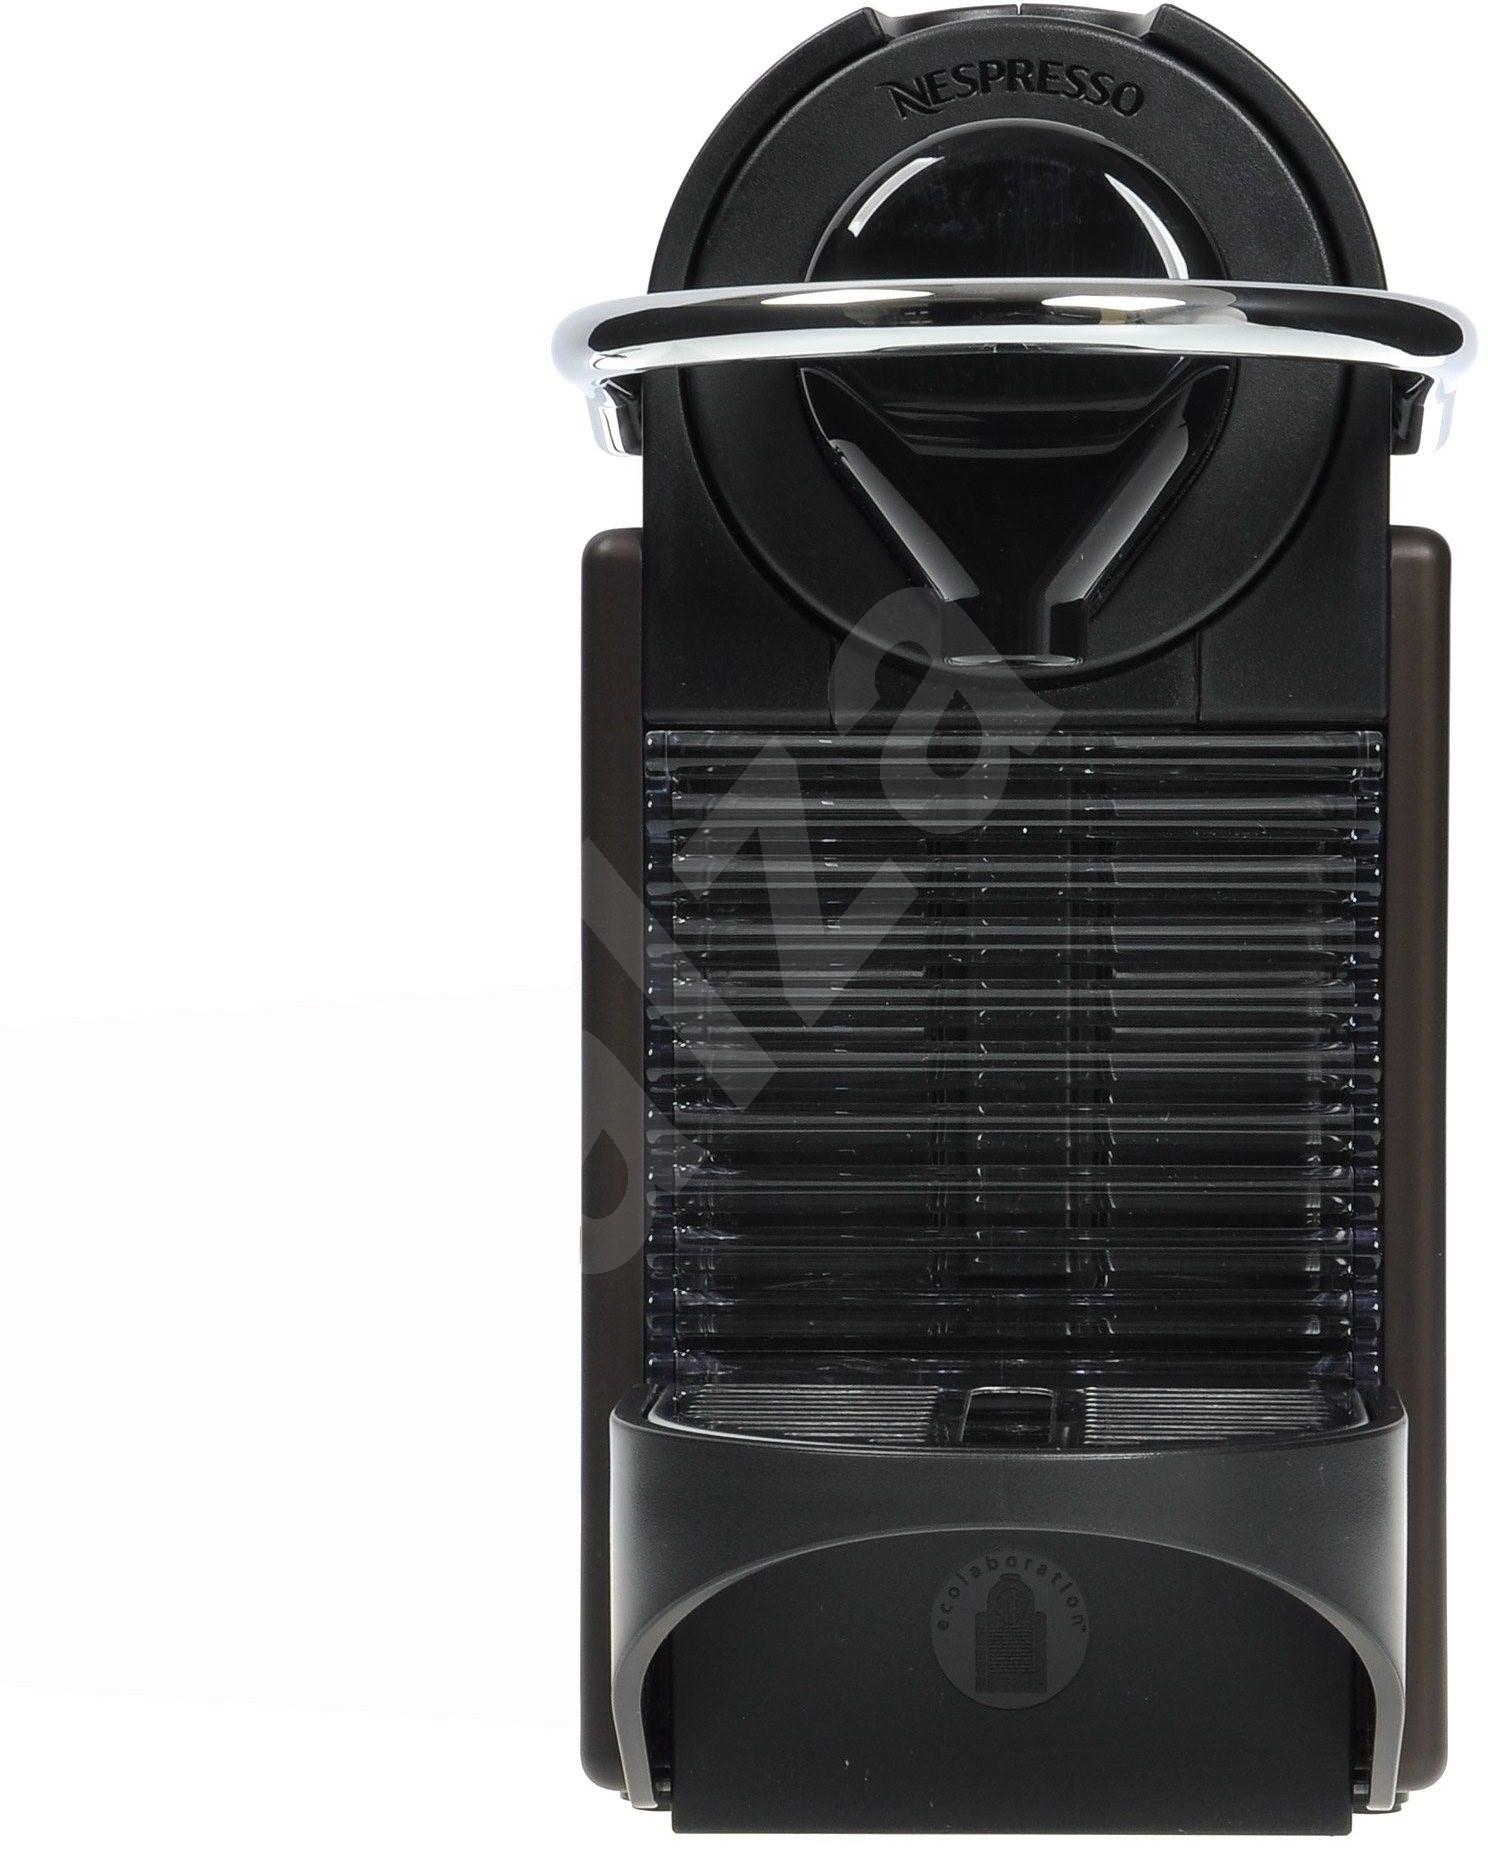 Nespresso Pixie Coffee Maker By Krups Brown : Krups Nespresso Pixie Electric Brown XN3008 - Espresso Machine Alzashop.com